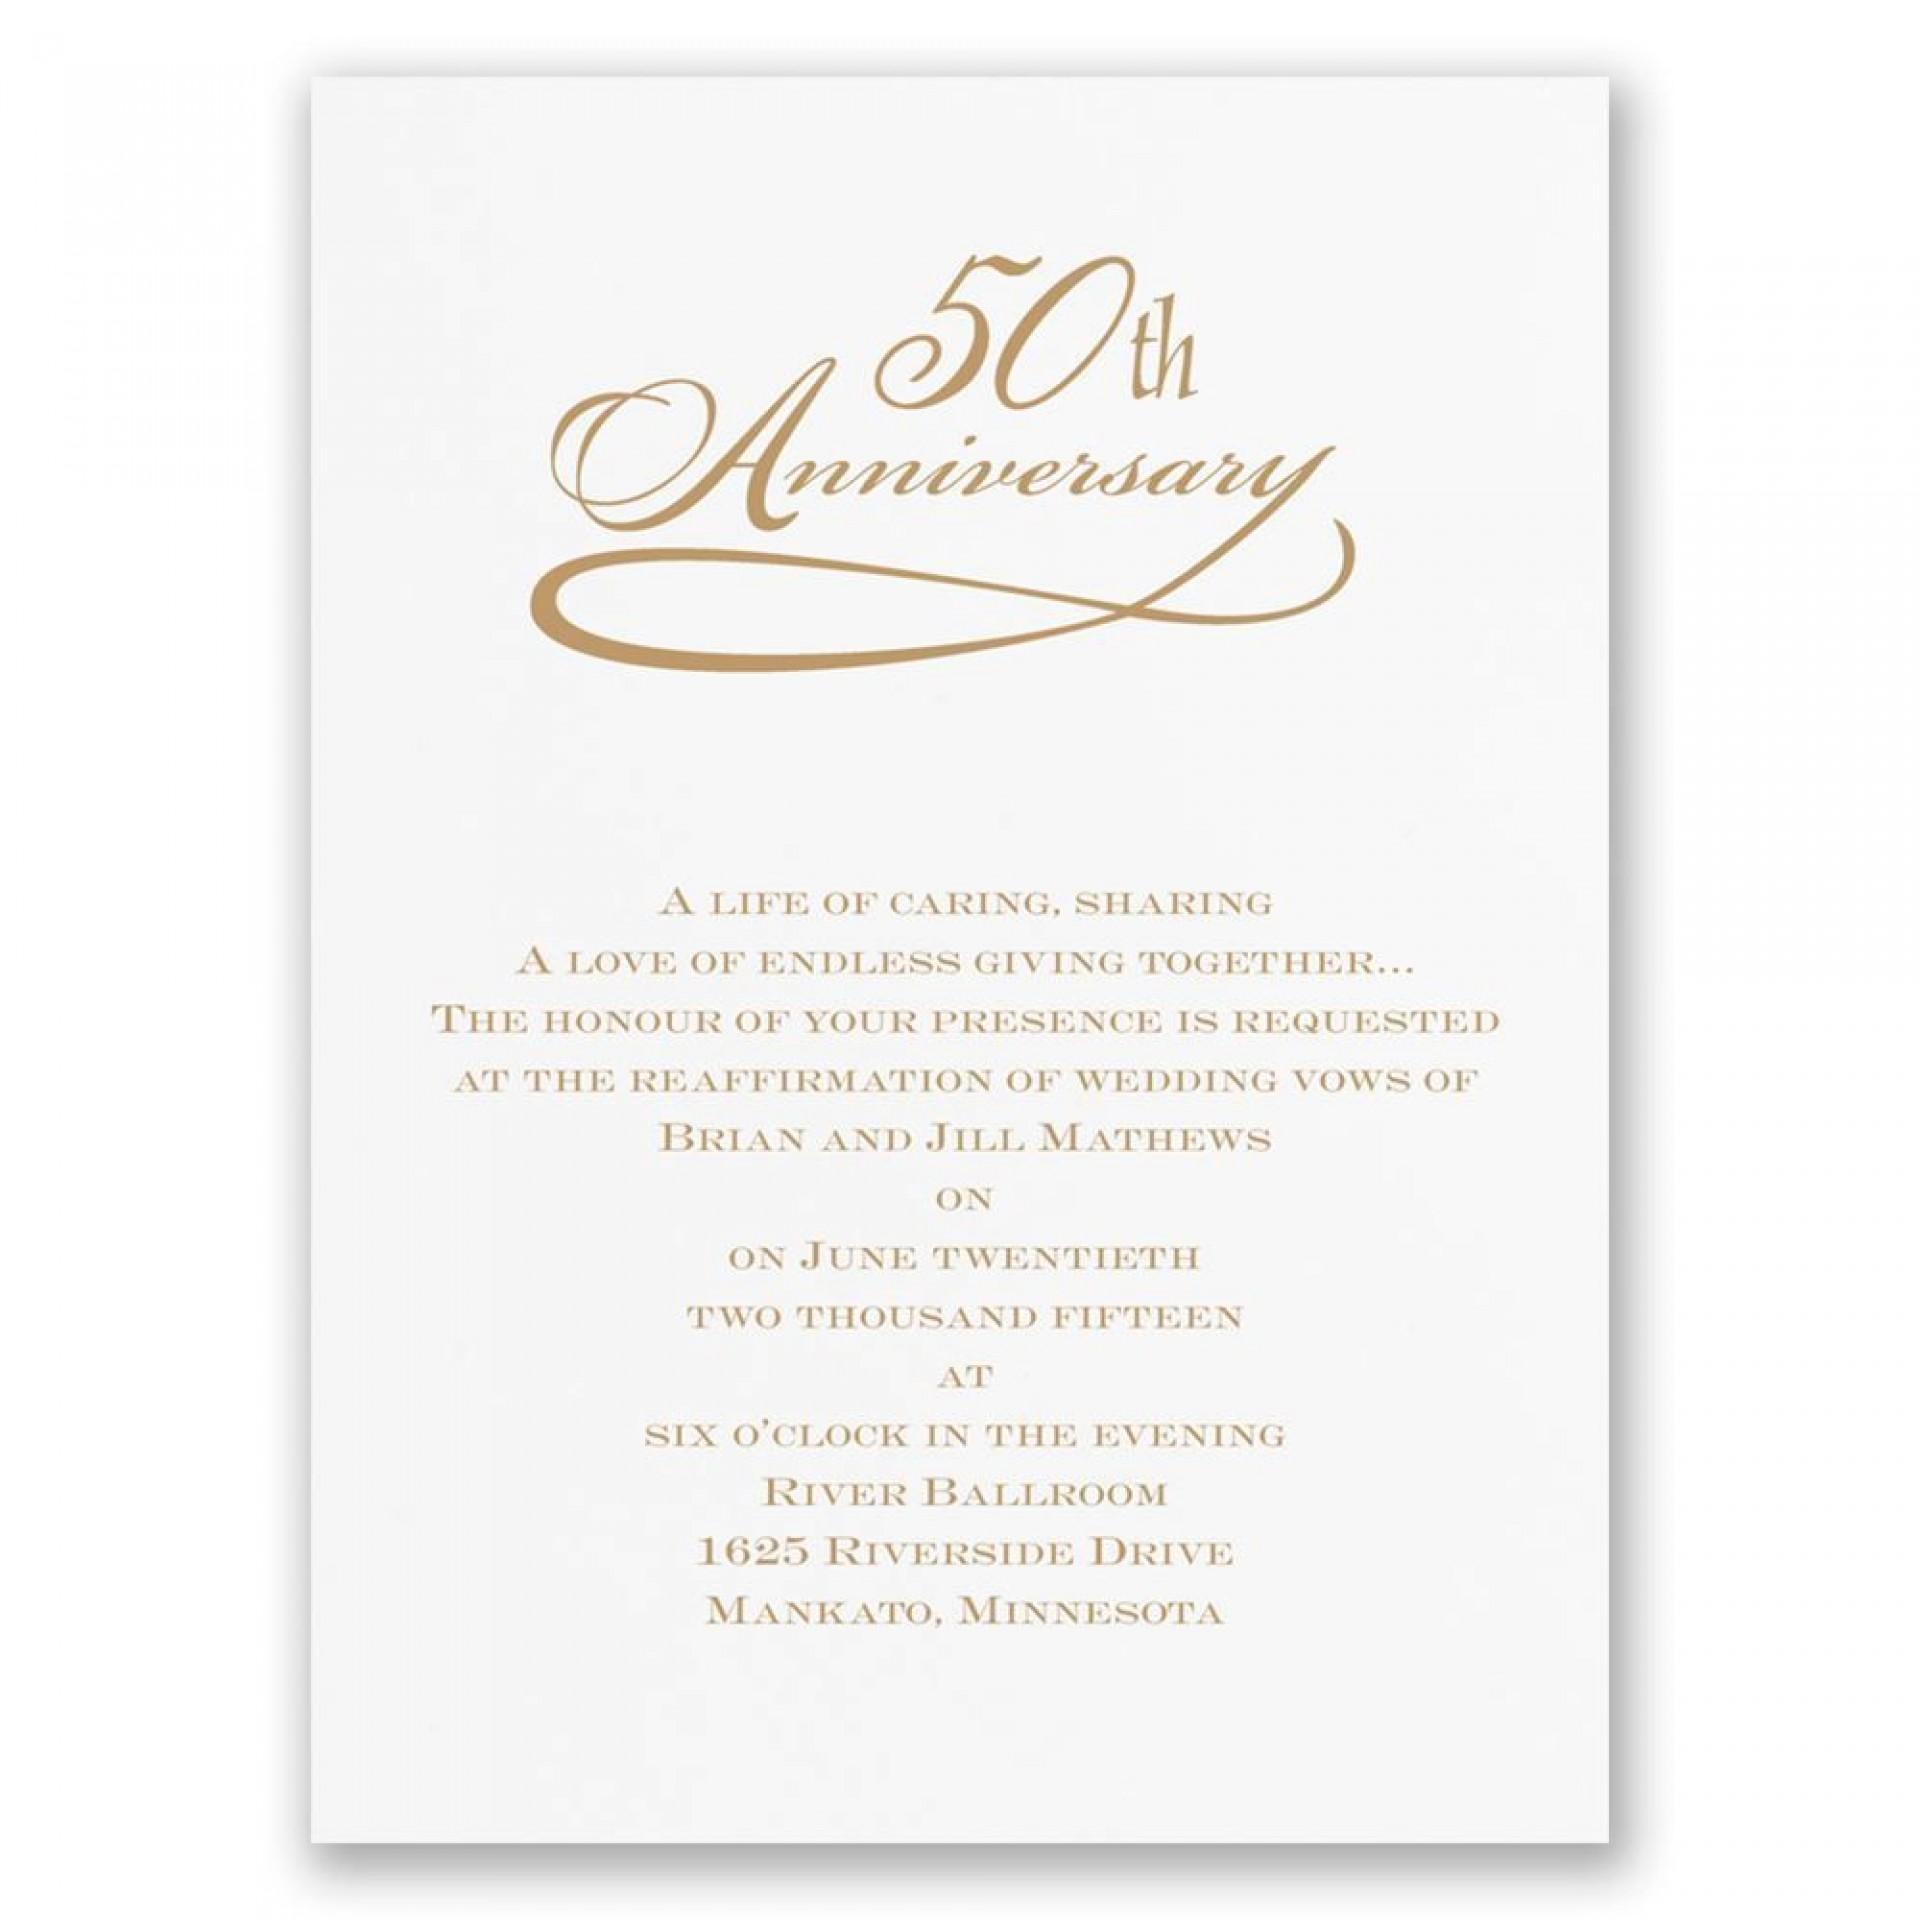 007 Stunning 50th Anniversary Invitation Wording Sample Highest Clarity  Samples Wedding Card1920